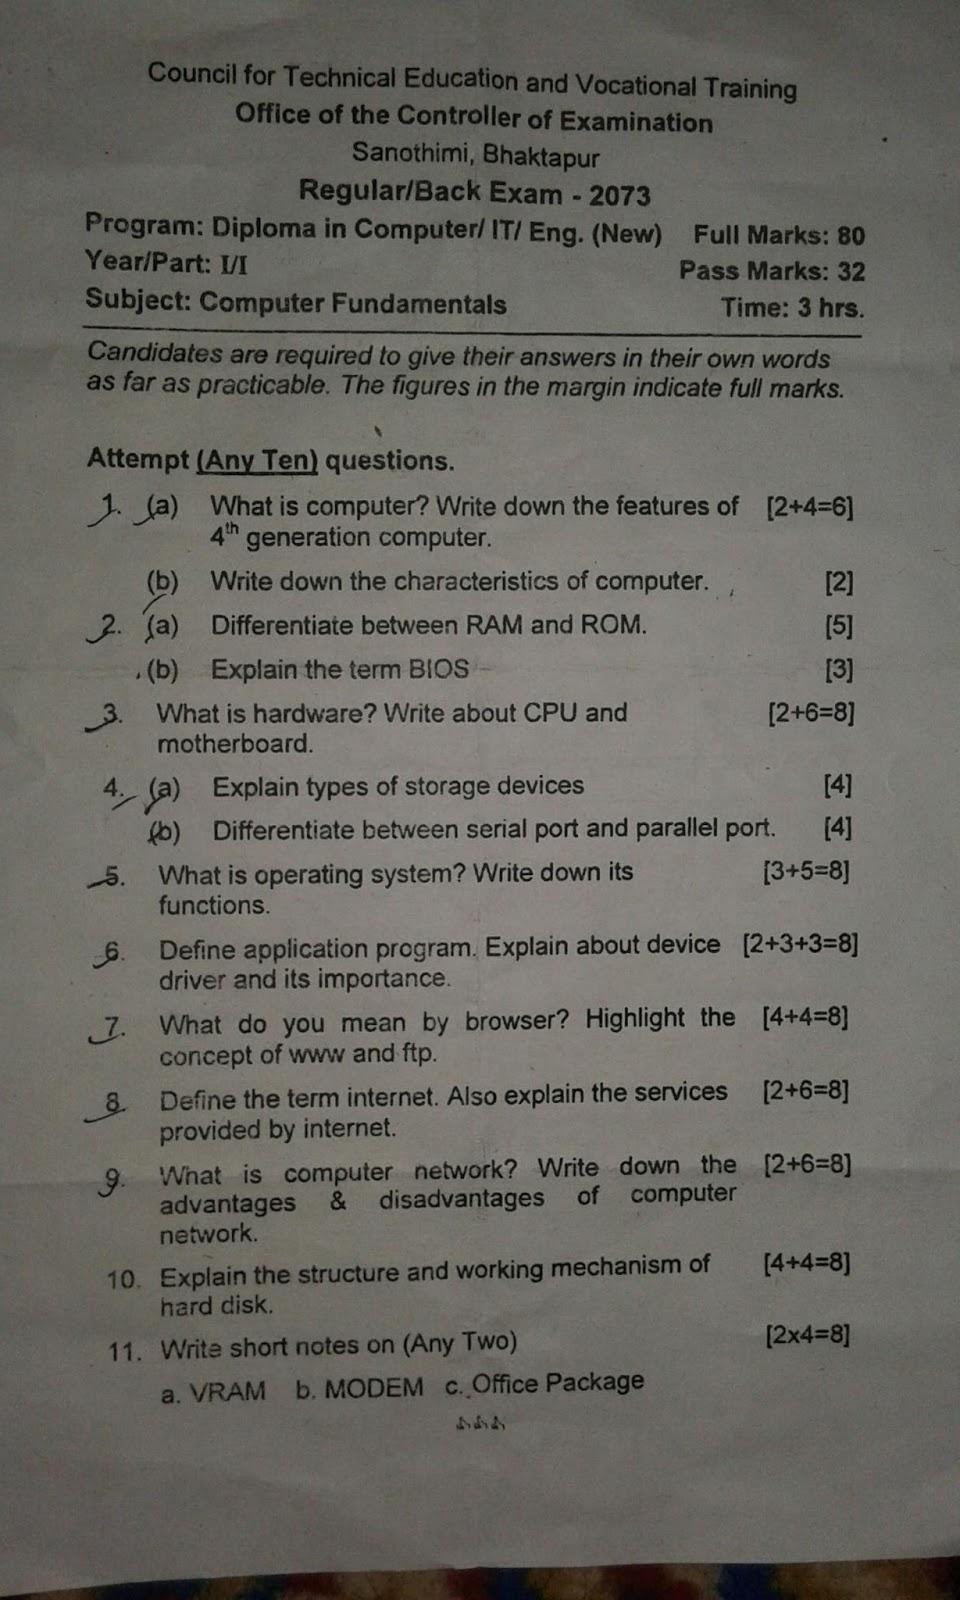 CTEVT-Computer-Fundamentals-Question-Paper-2073-Diploma-1st-Year-1st-Part